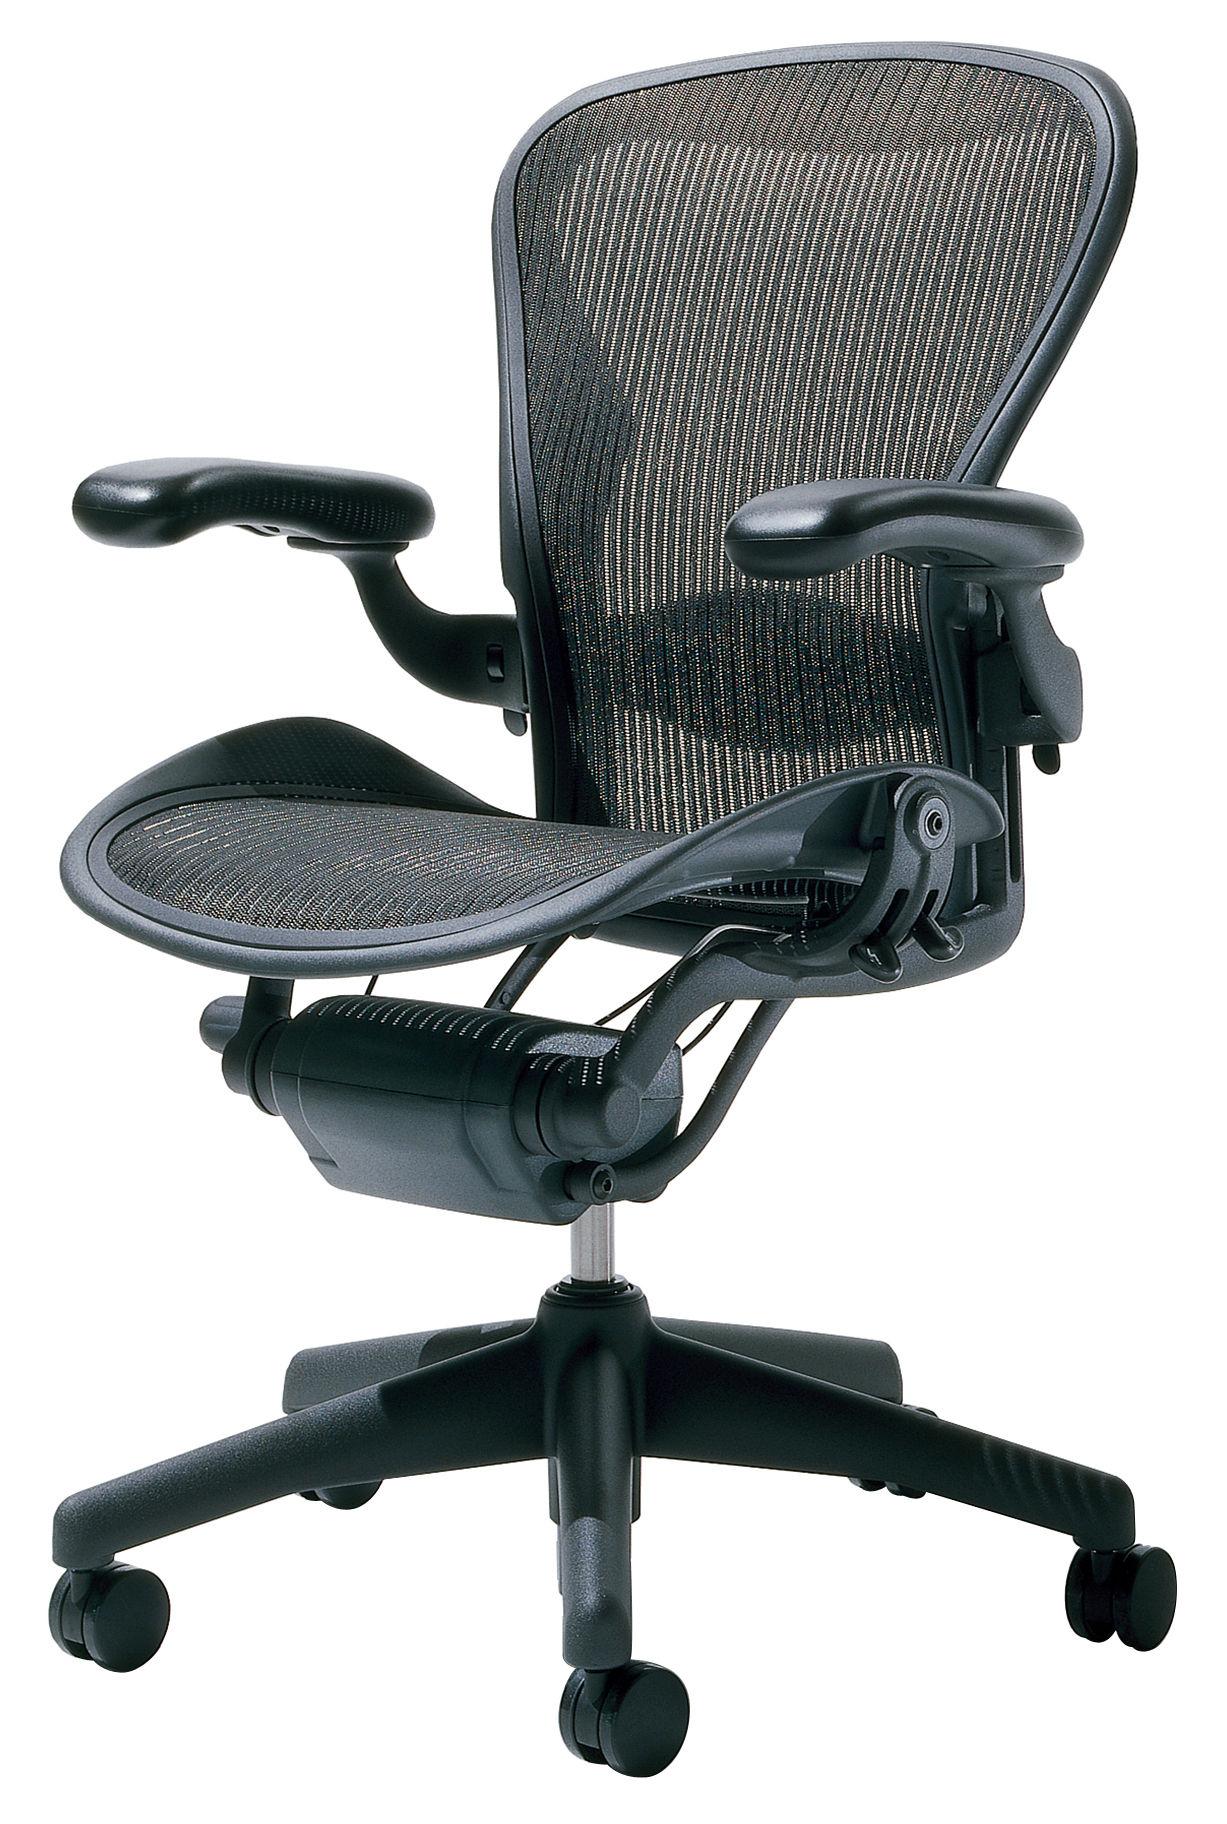 Rentrée 2011 UK - Bureau design - Poltrona a rotelle Aeron di Herman Miller - Grafite (nera) - alluminio verniciato, Retina